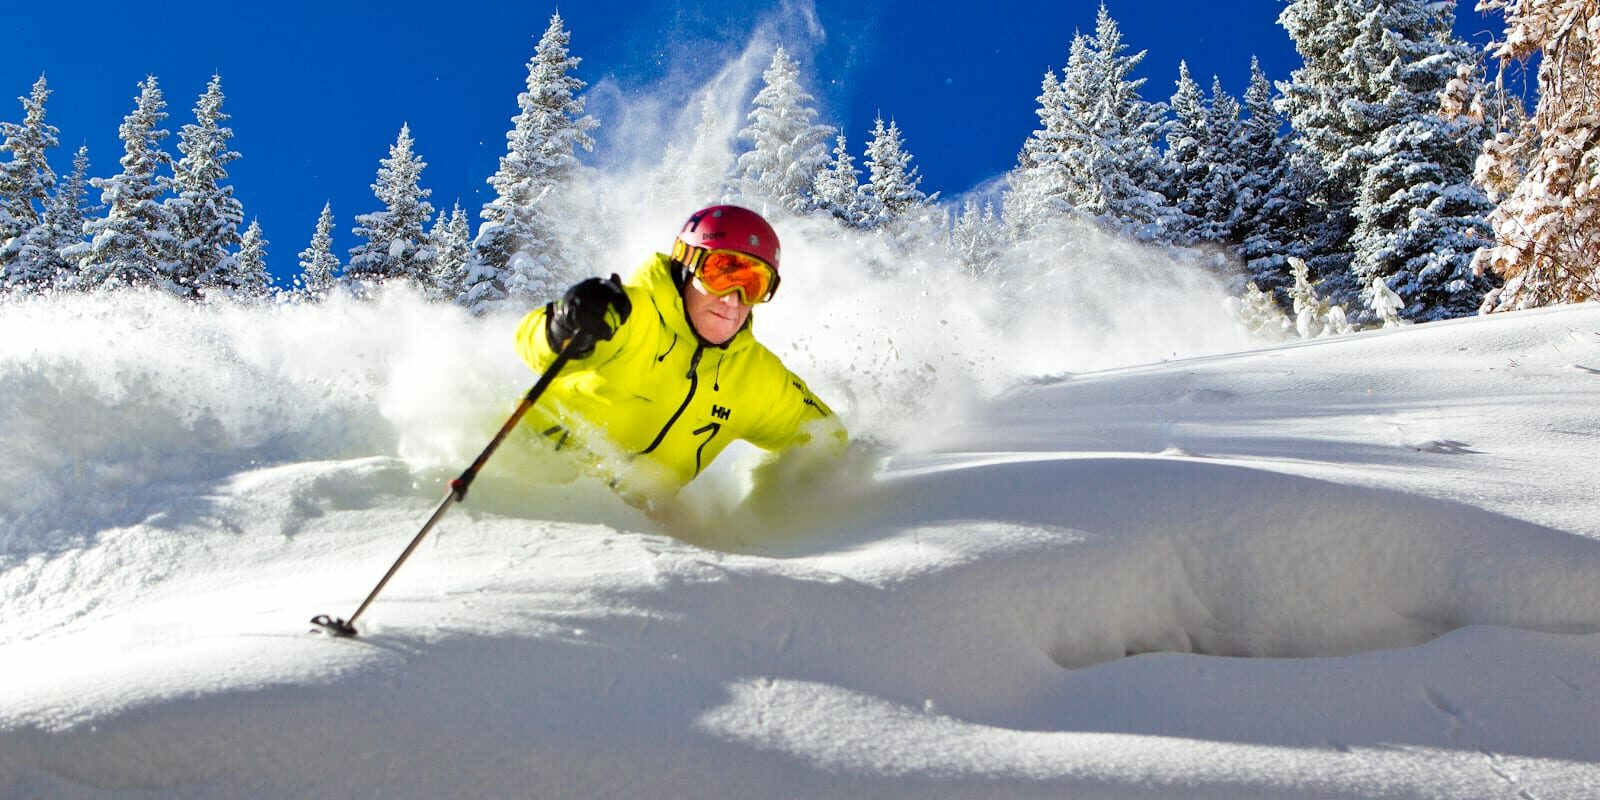 Colorado Ski Season Passes Vail Ski Resort Powder Day